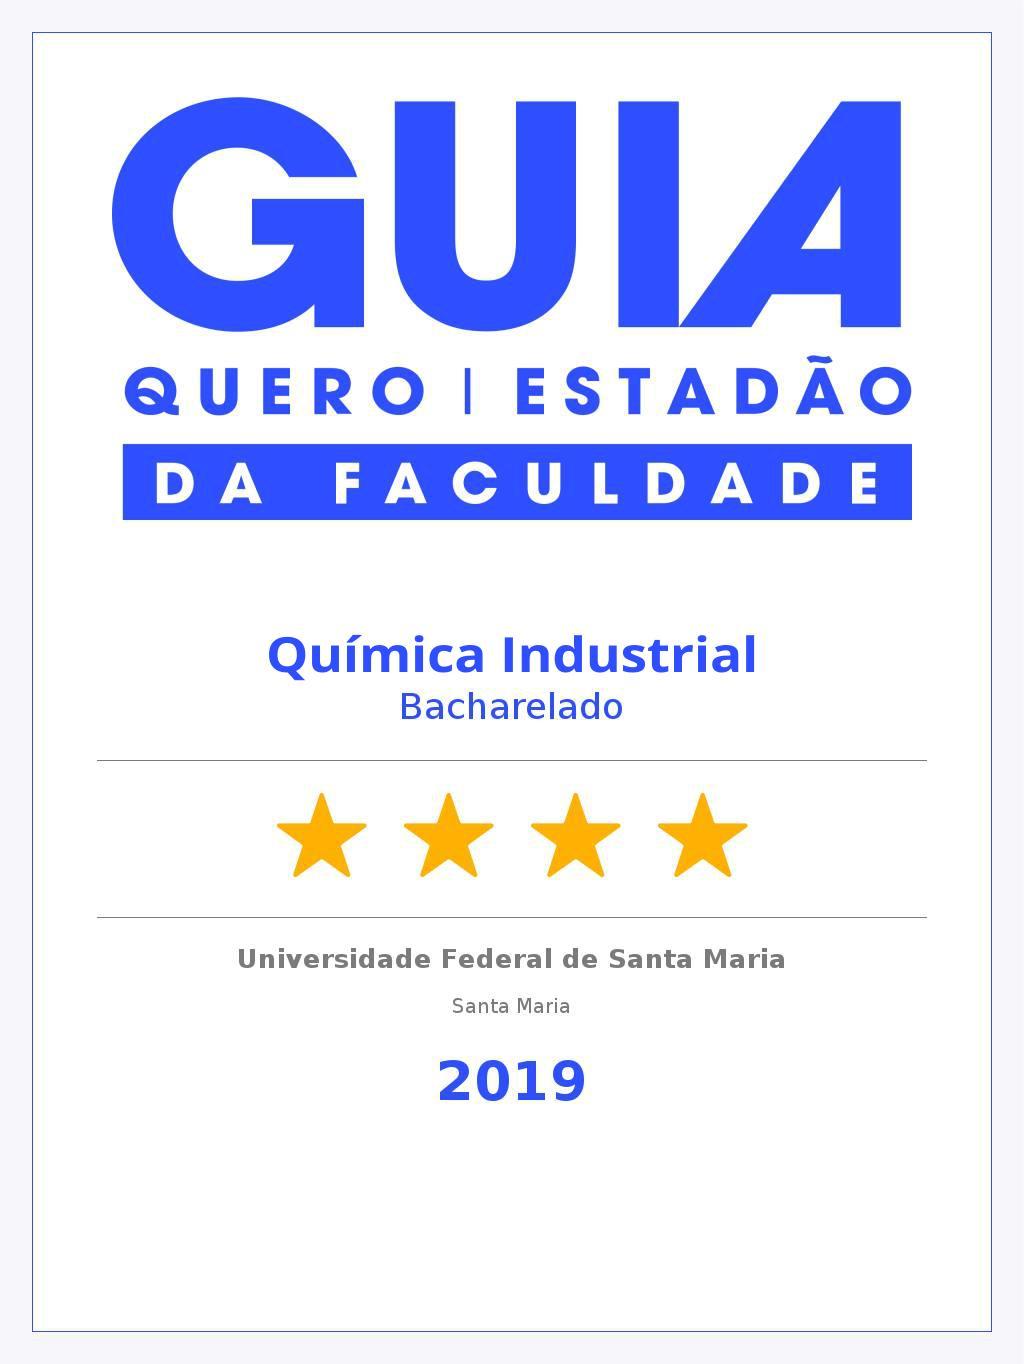 Guia da Faculdade 2019 - Química Industrial